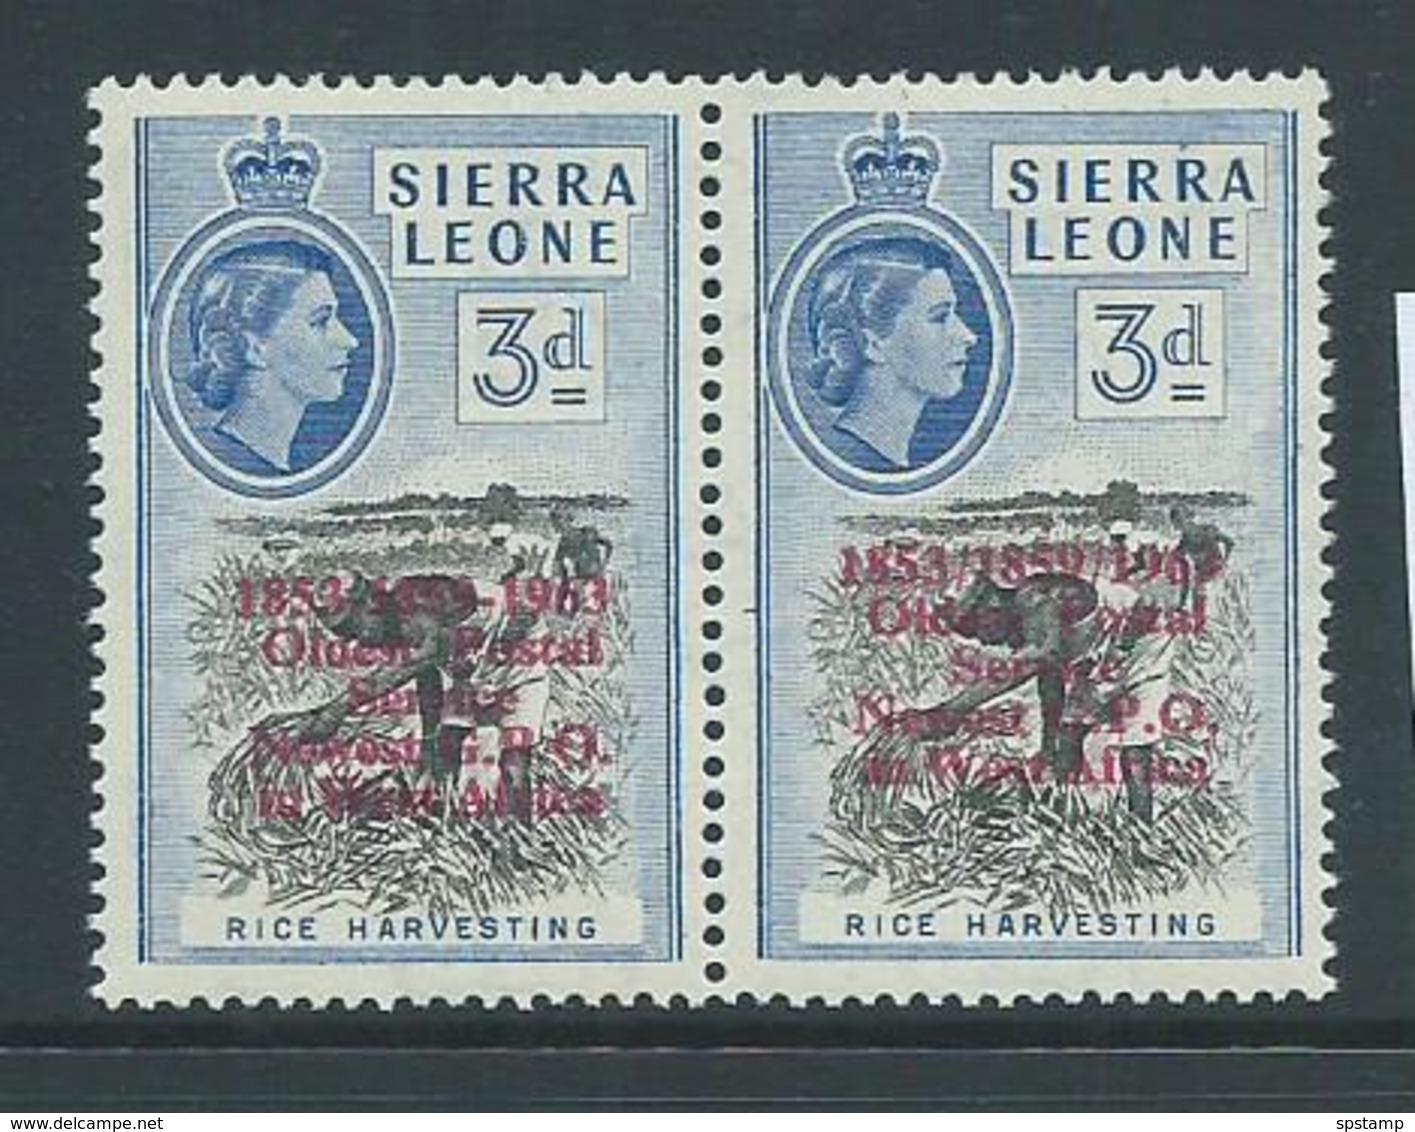 "Sierra Leone 1963 Postal Anniversary 3d  "" Forward Slash For Hyphen "" Variety MLH - Sierra Leone (1961-...)"